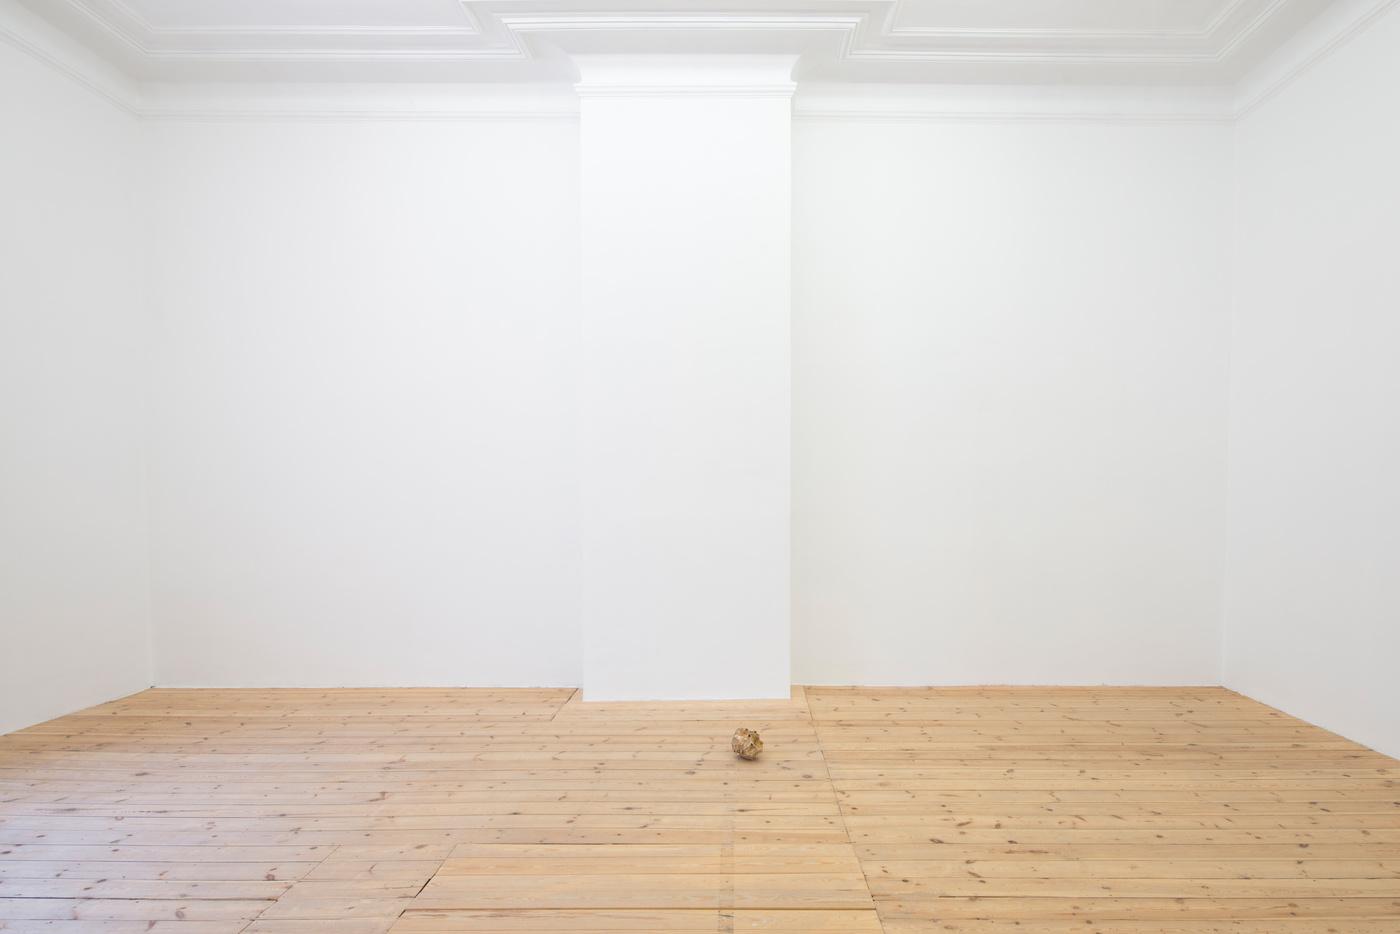 Ariel Schlesinger, Untitled (Inside Out Skull), 2014 (8)